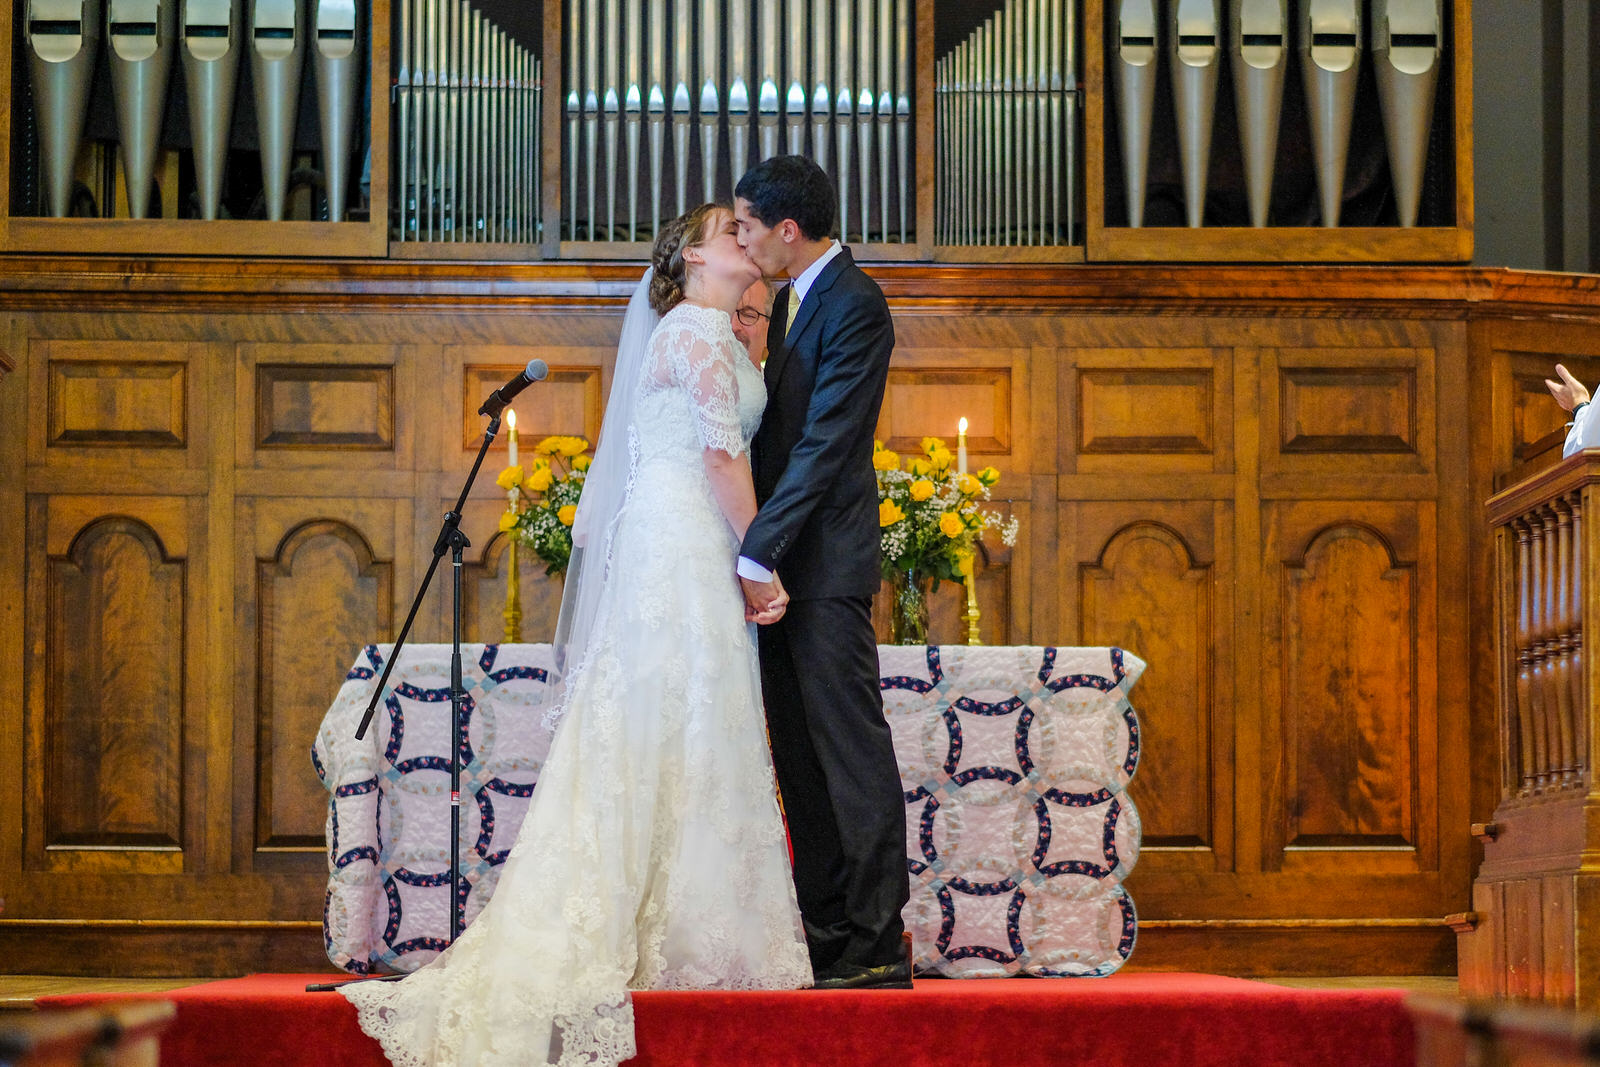 candid-vermont-wedding-photography-625.jpg